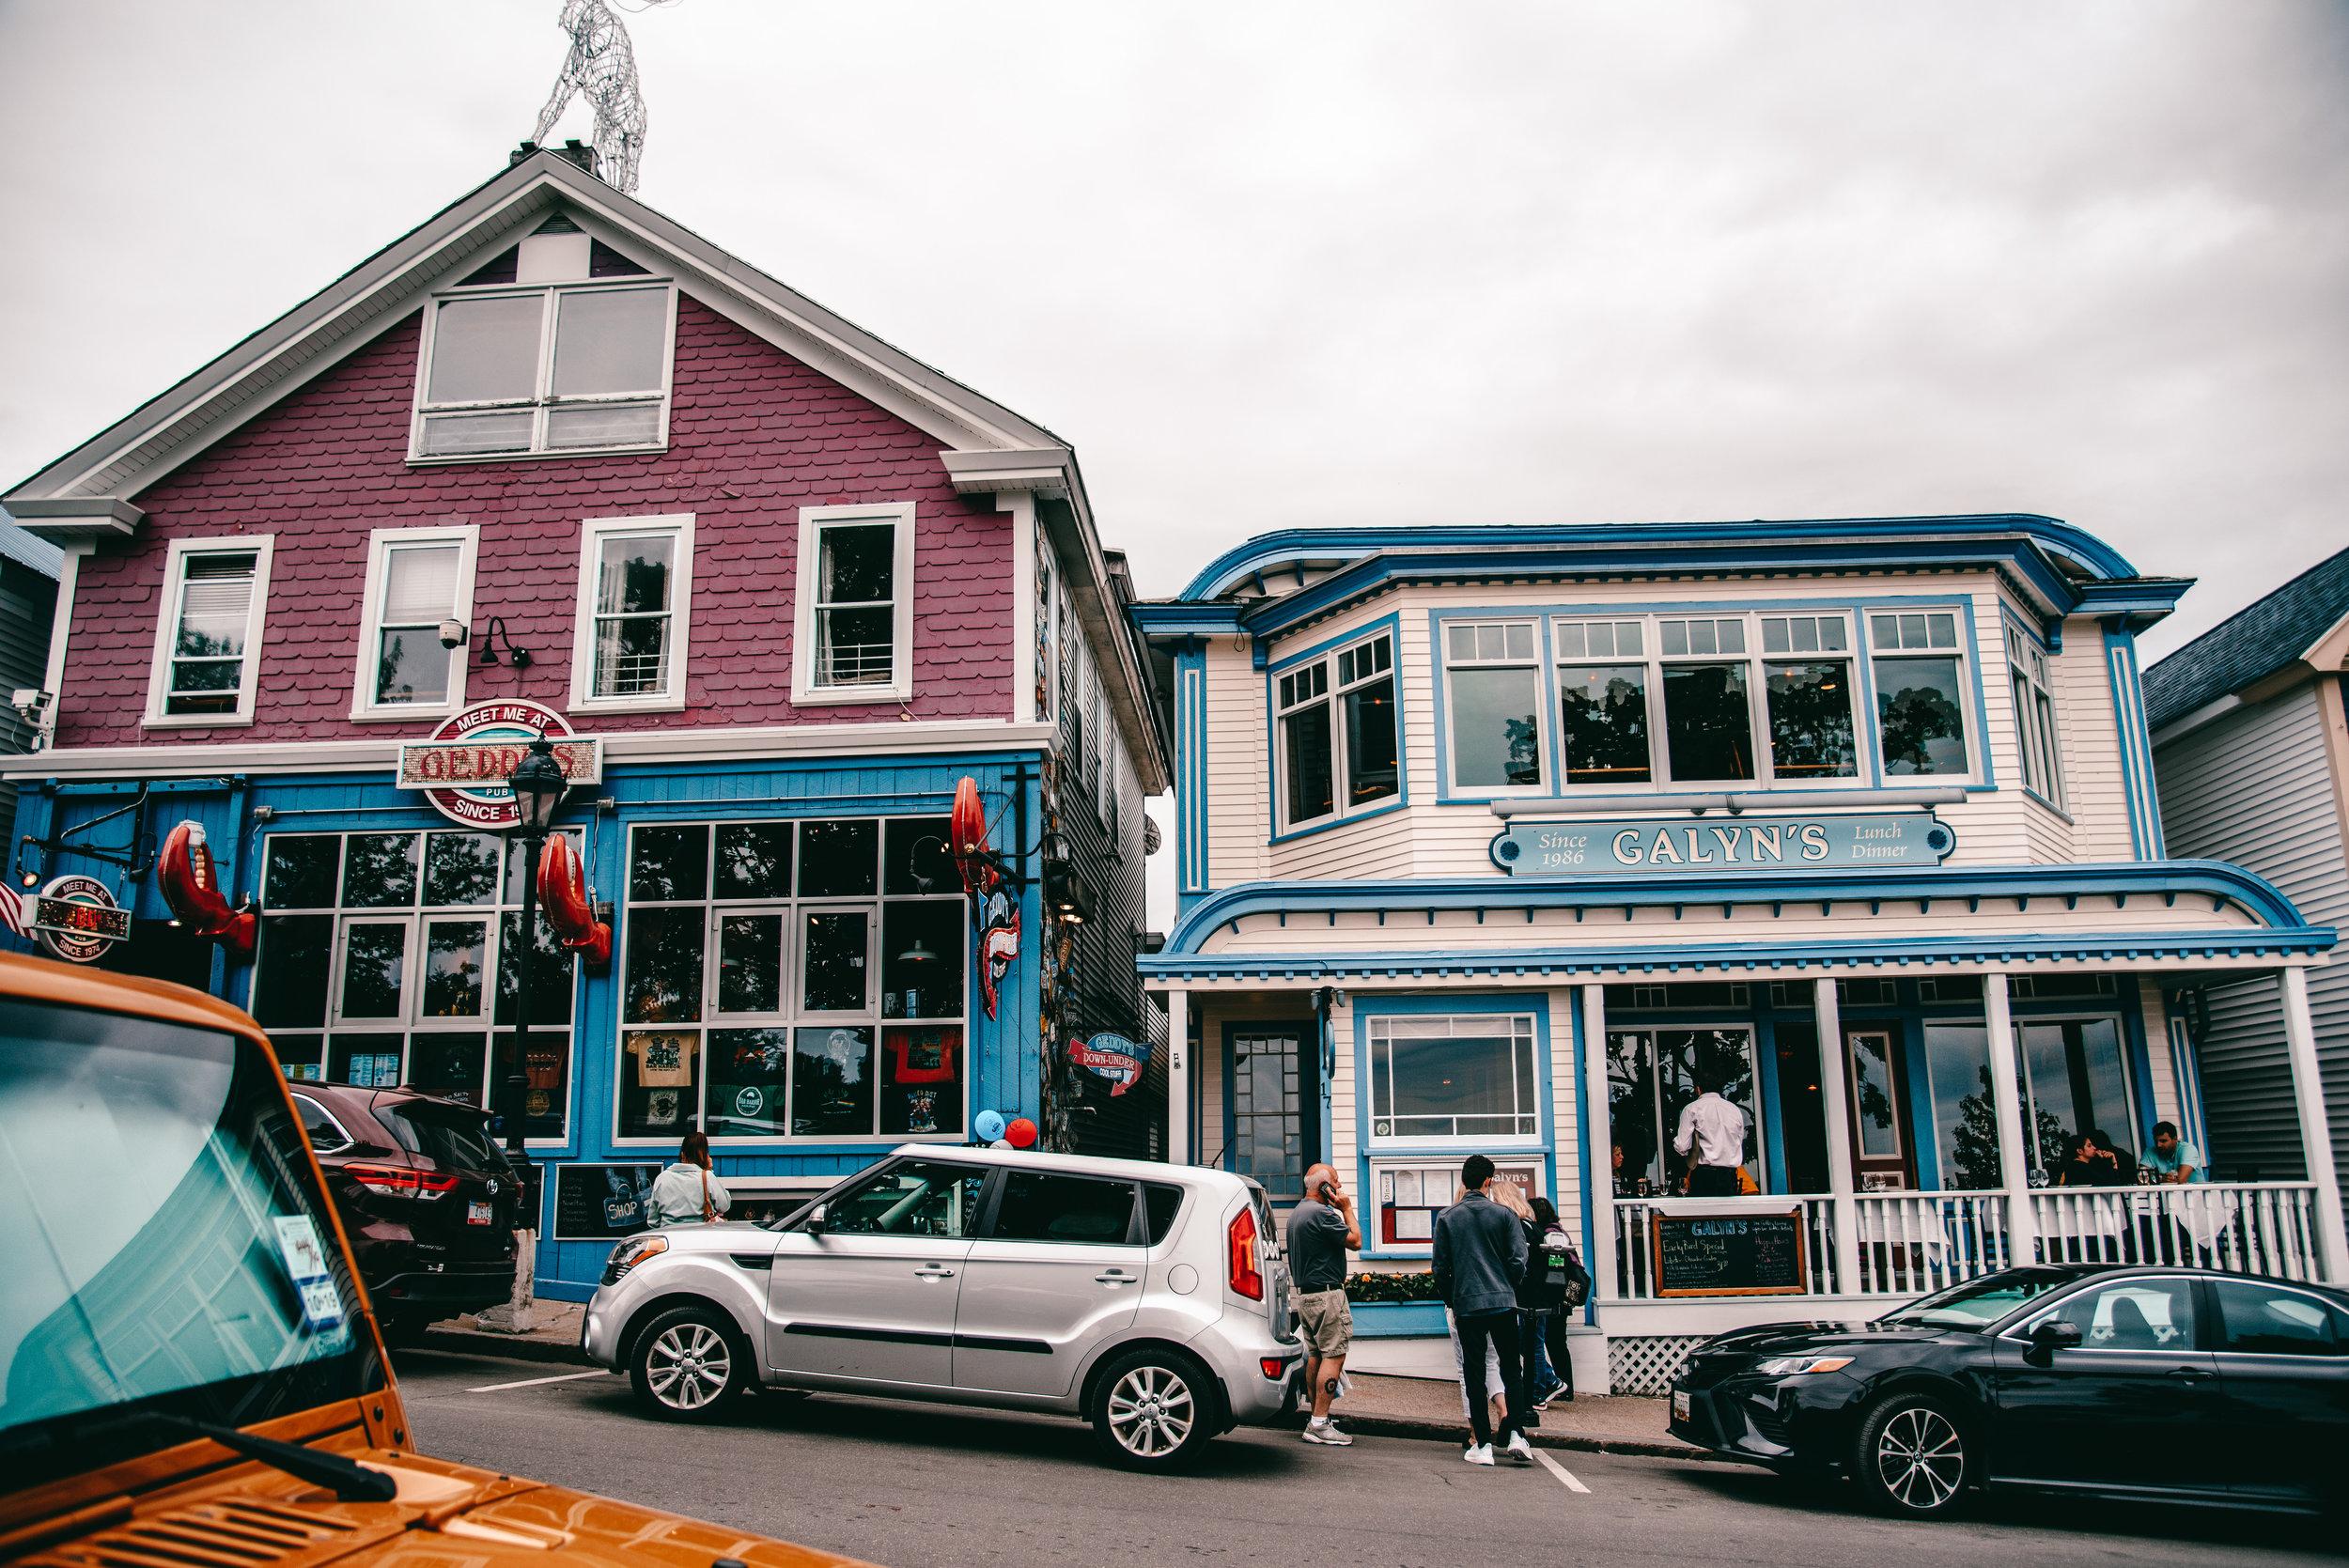 Bar Harbor town